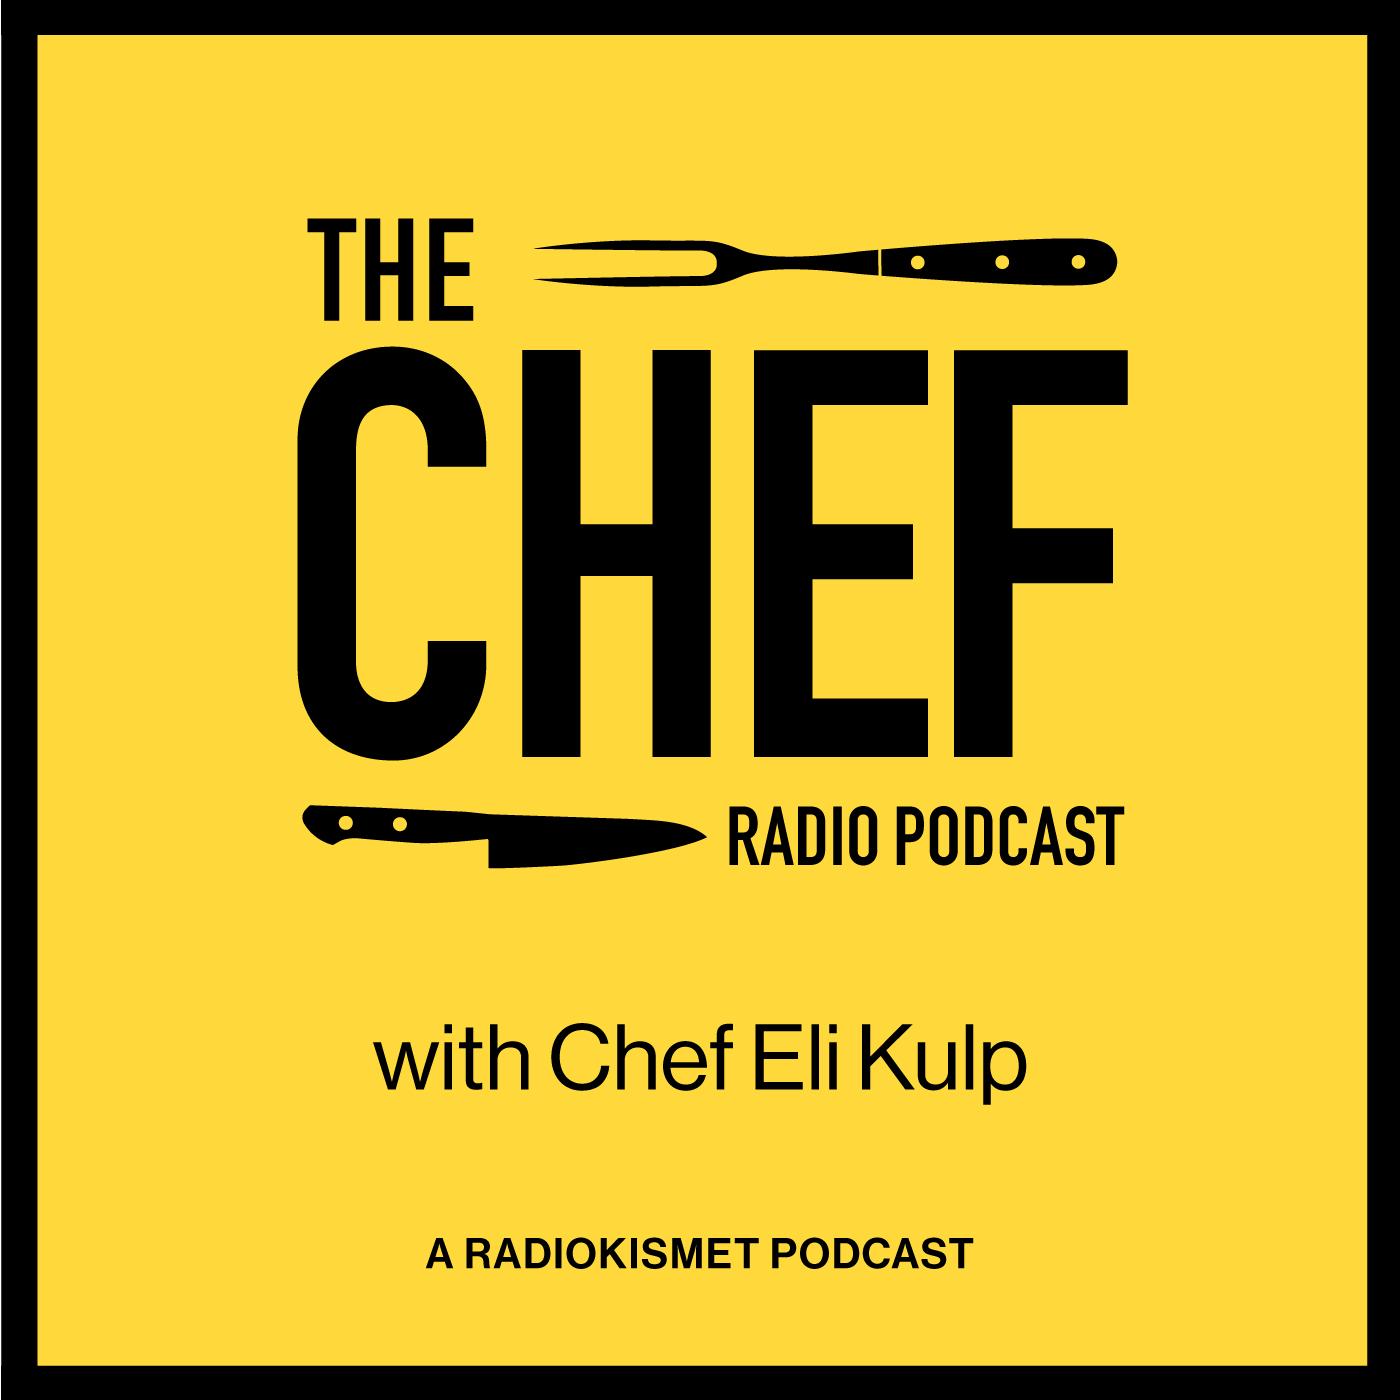 The CHEF Radio Podcast show art